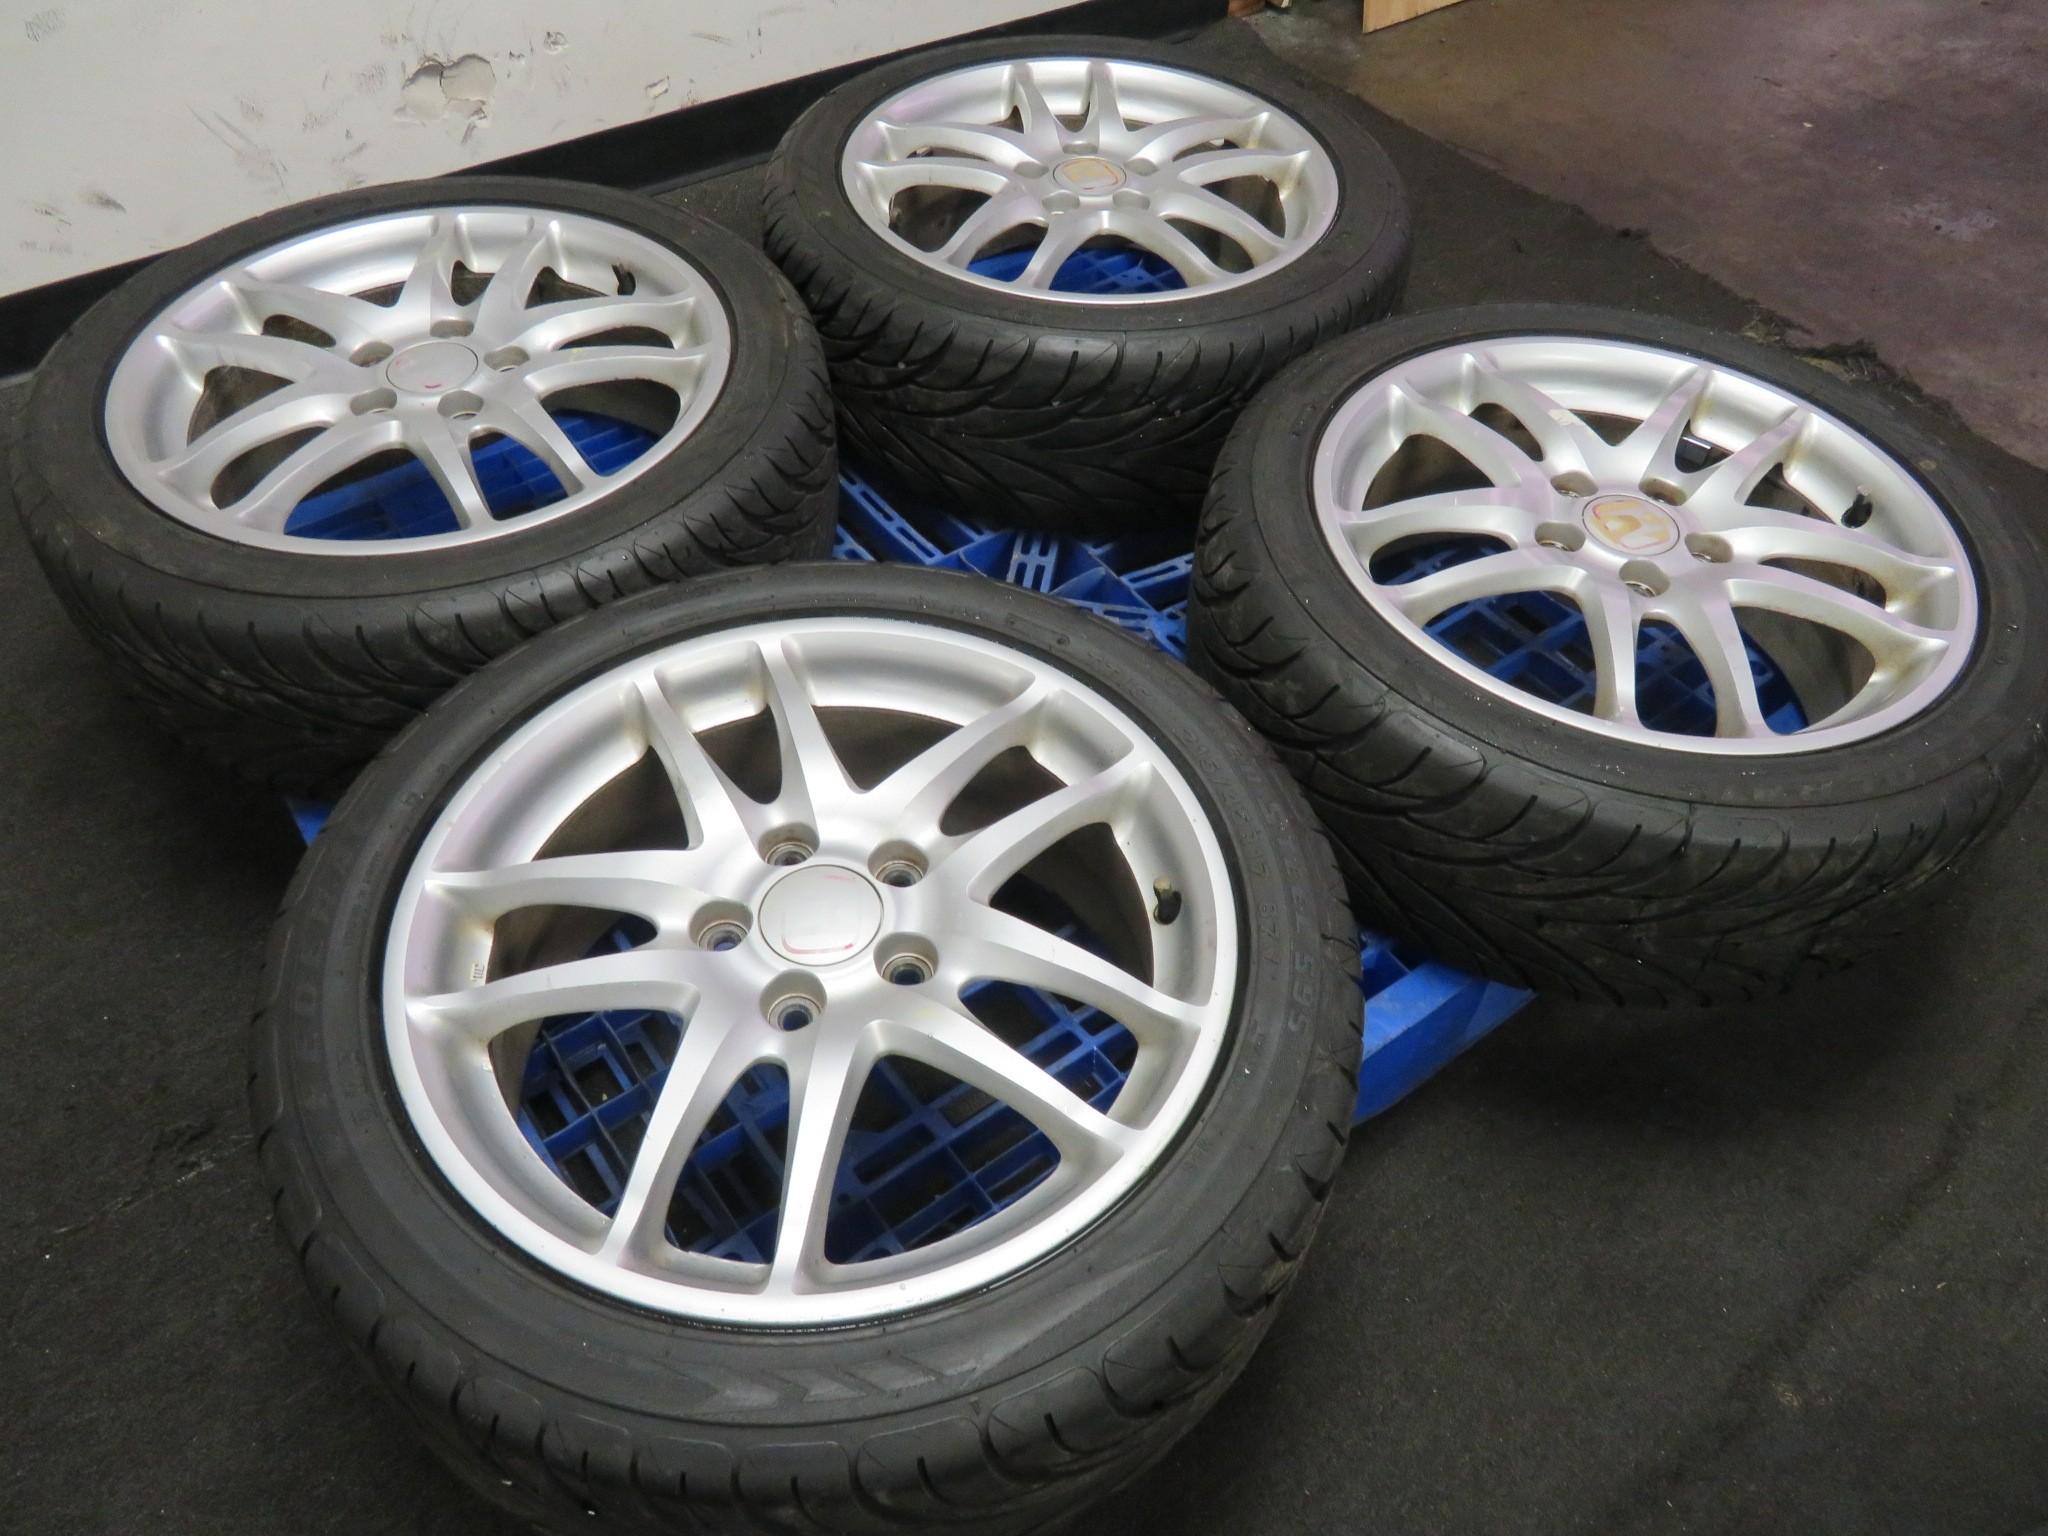 jdm dc5 honda integra type r 17 wheels 17x7 5x114 3 k20a 5 lug rsx rims jdm king motors corp jdm dc5 honda integra type r 17